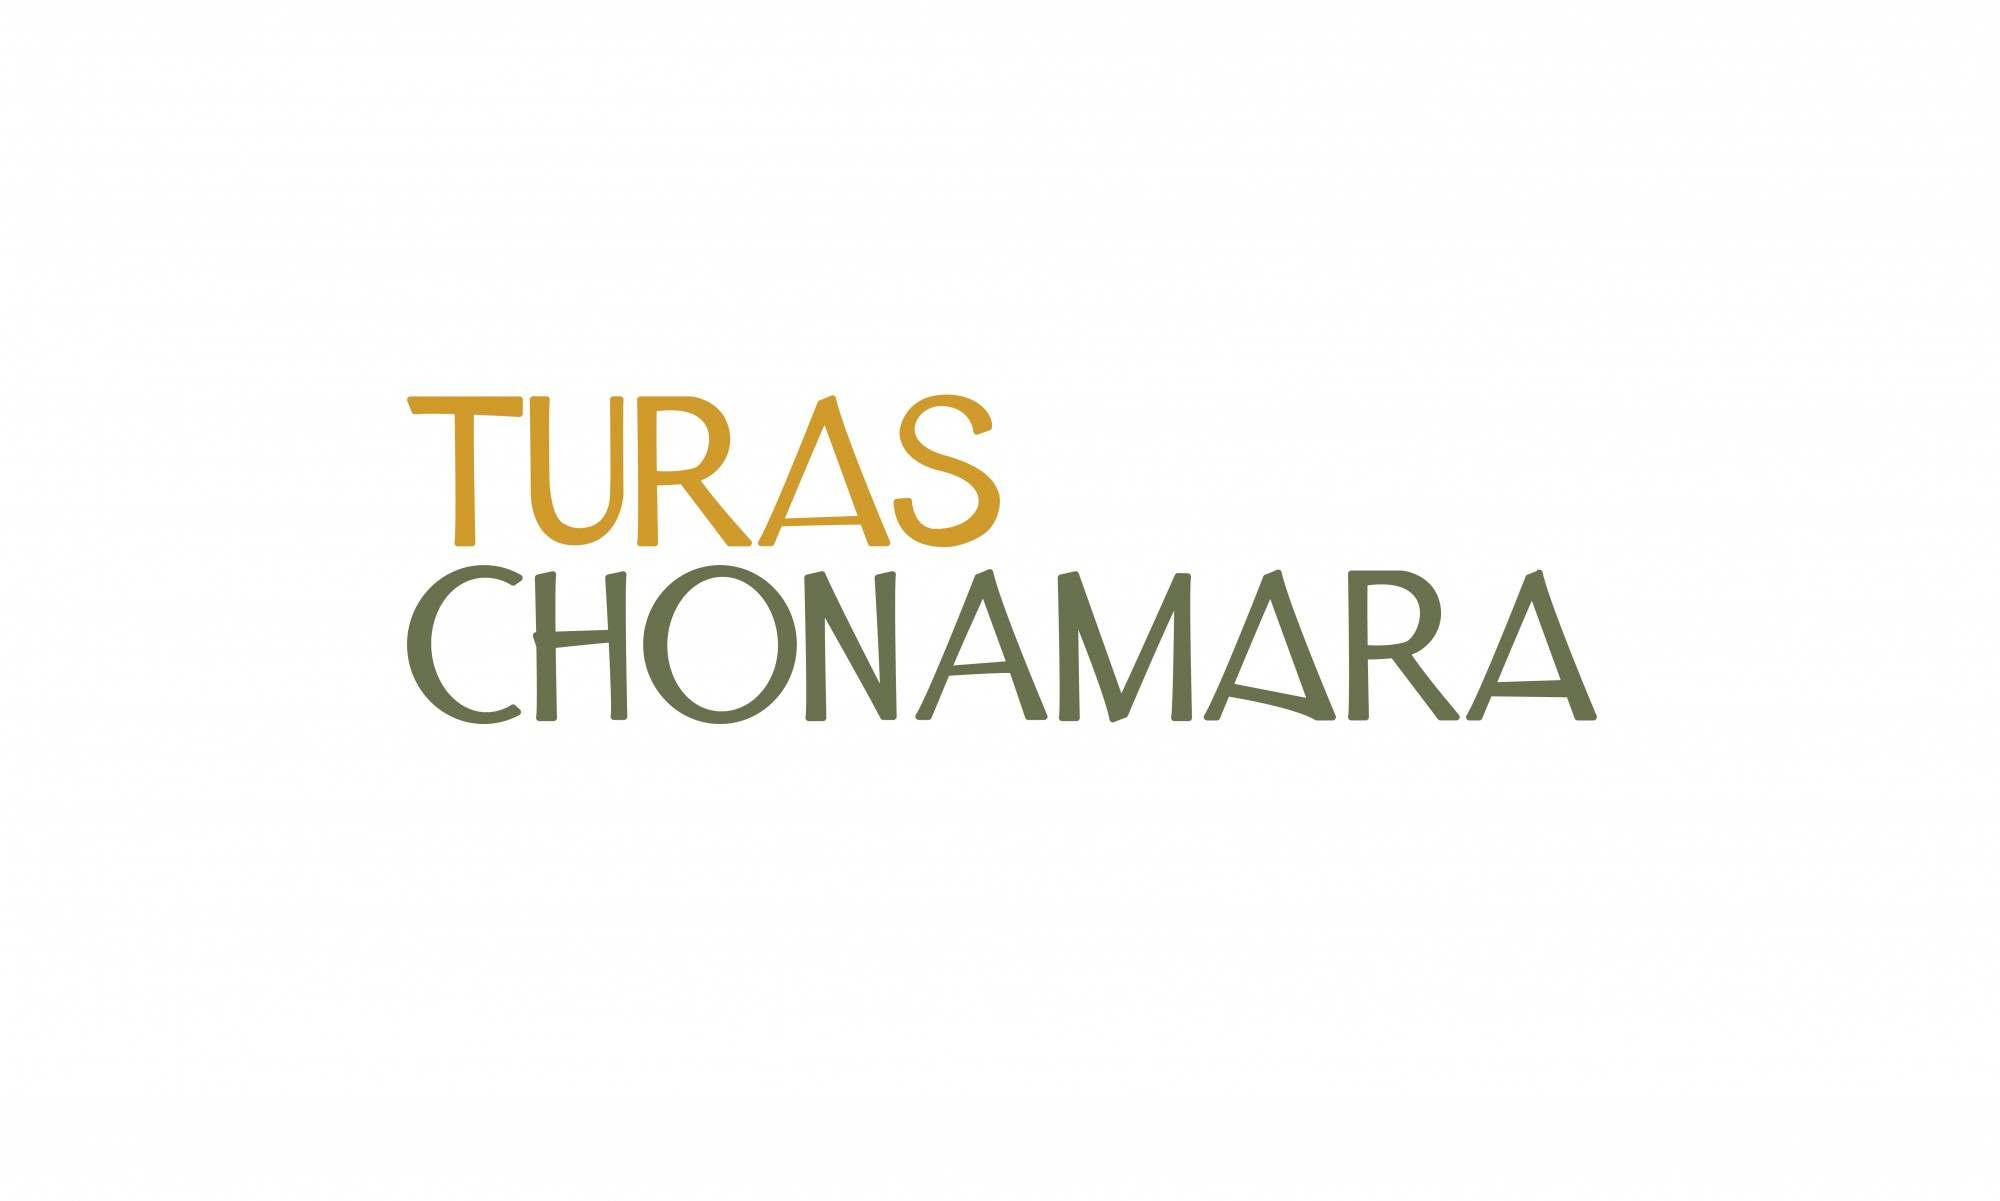 Cover image: Turas Connamara